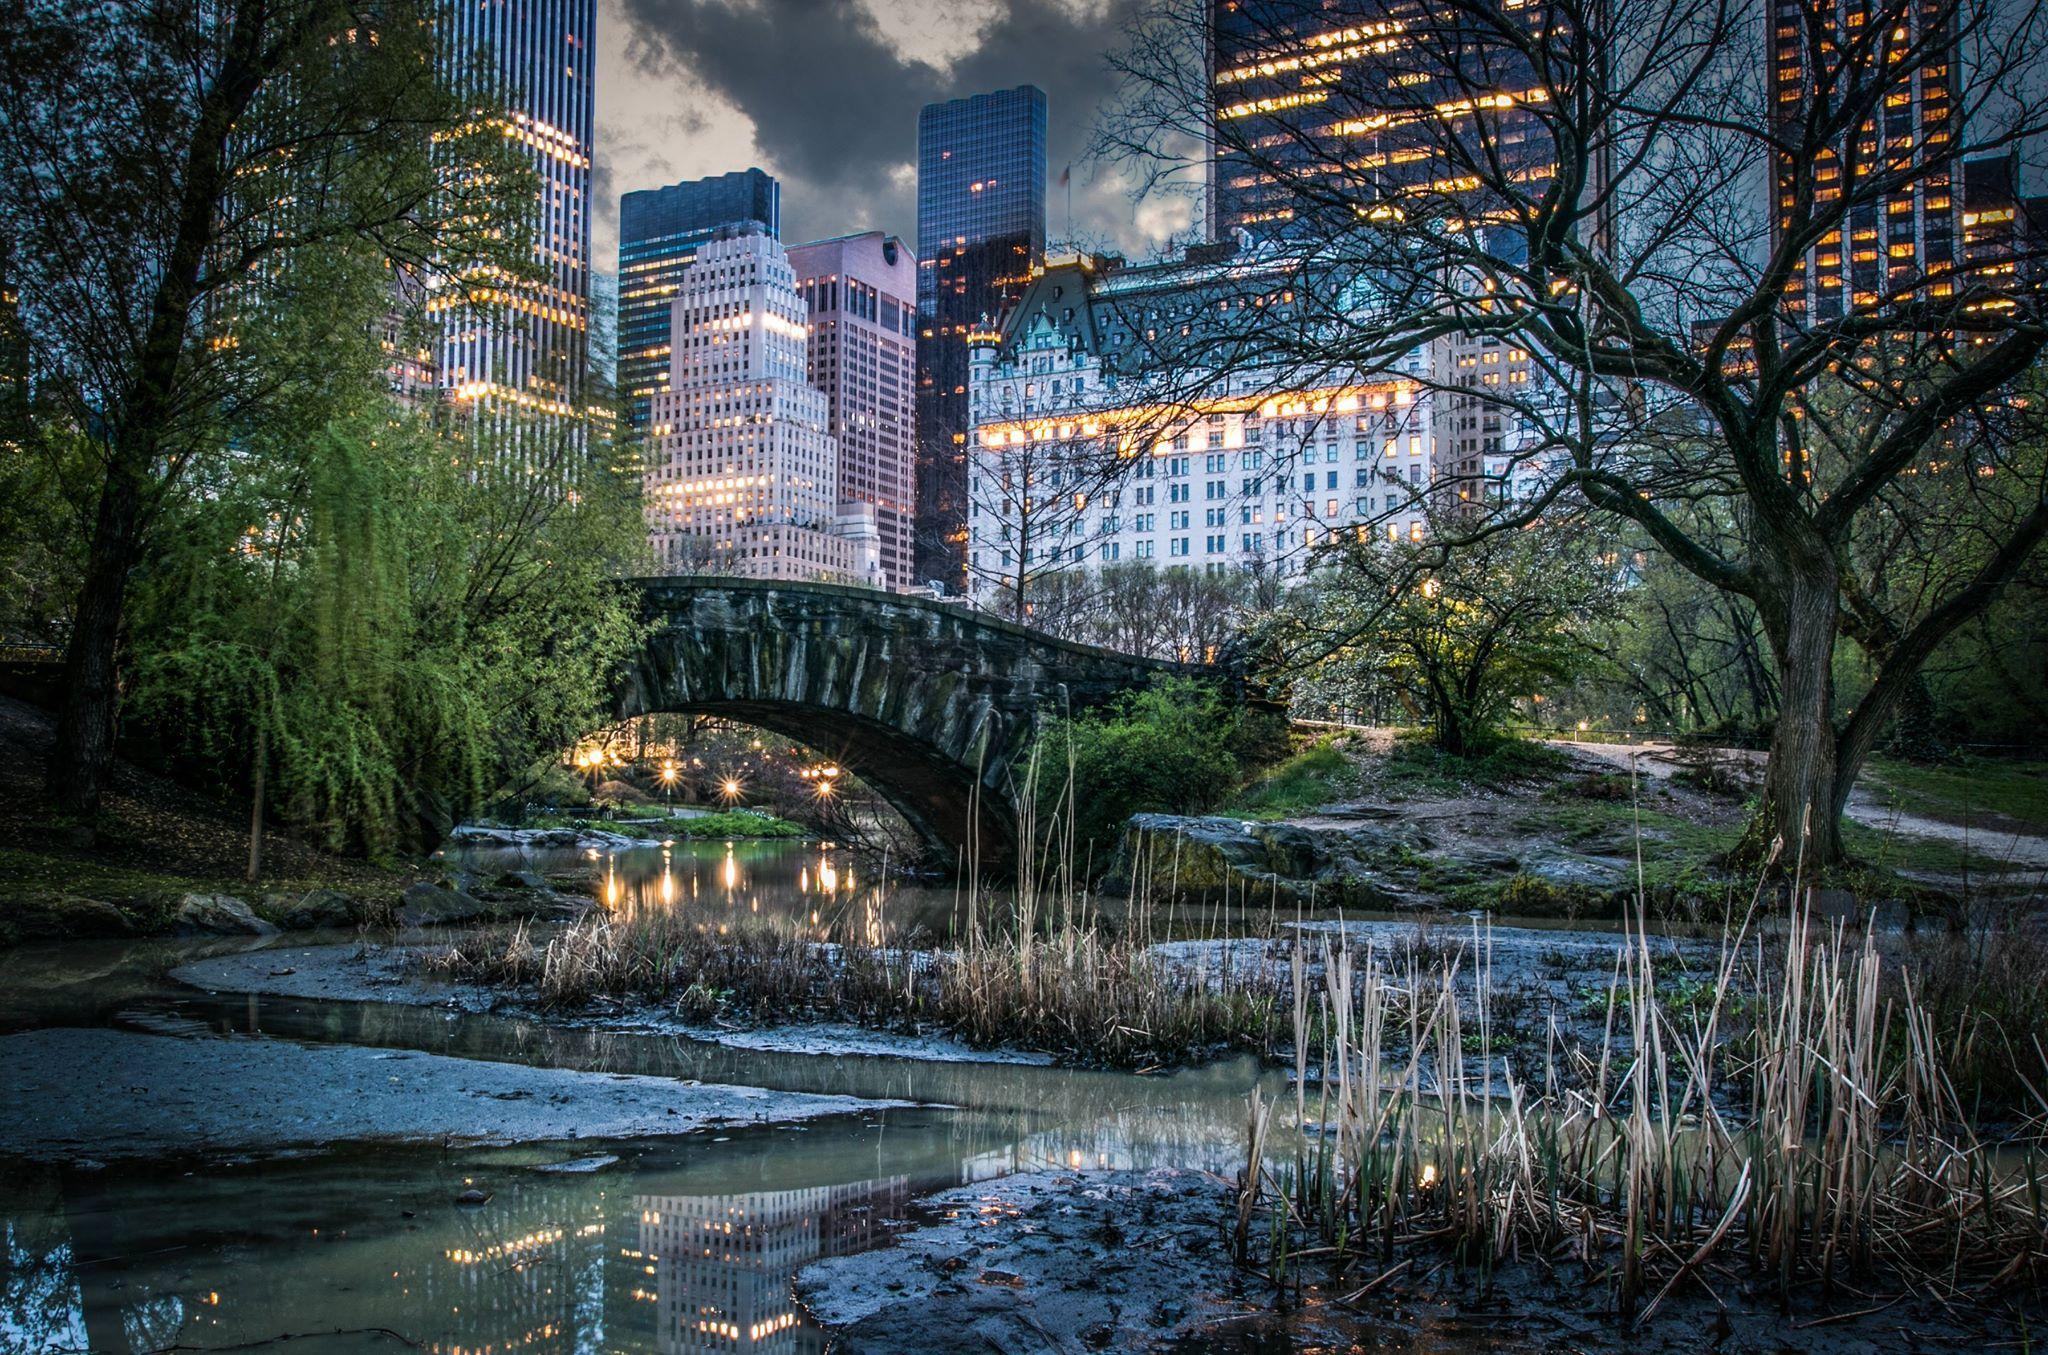 Central Park Proposal at the Gapstow Bridge | Heiratsantrag